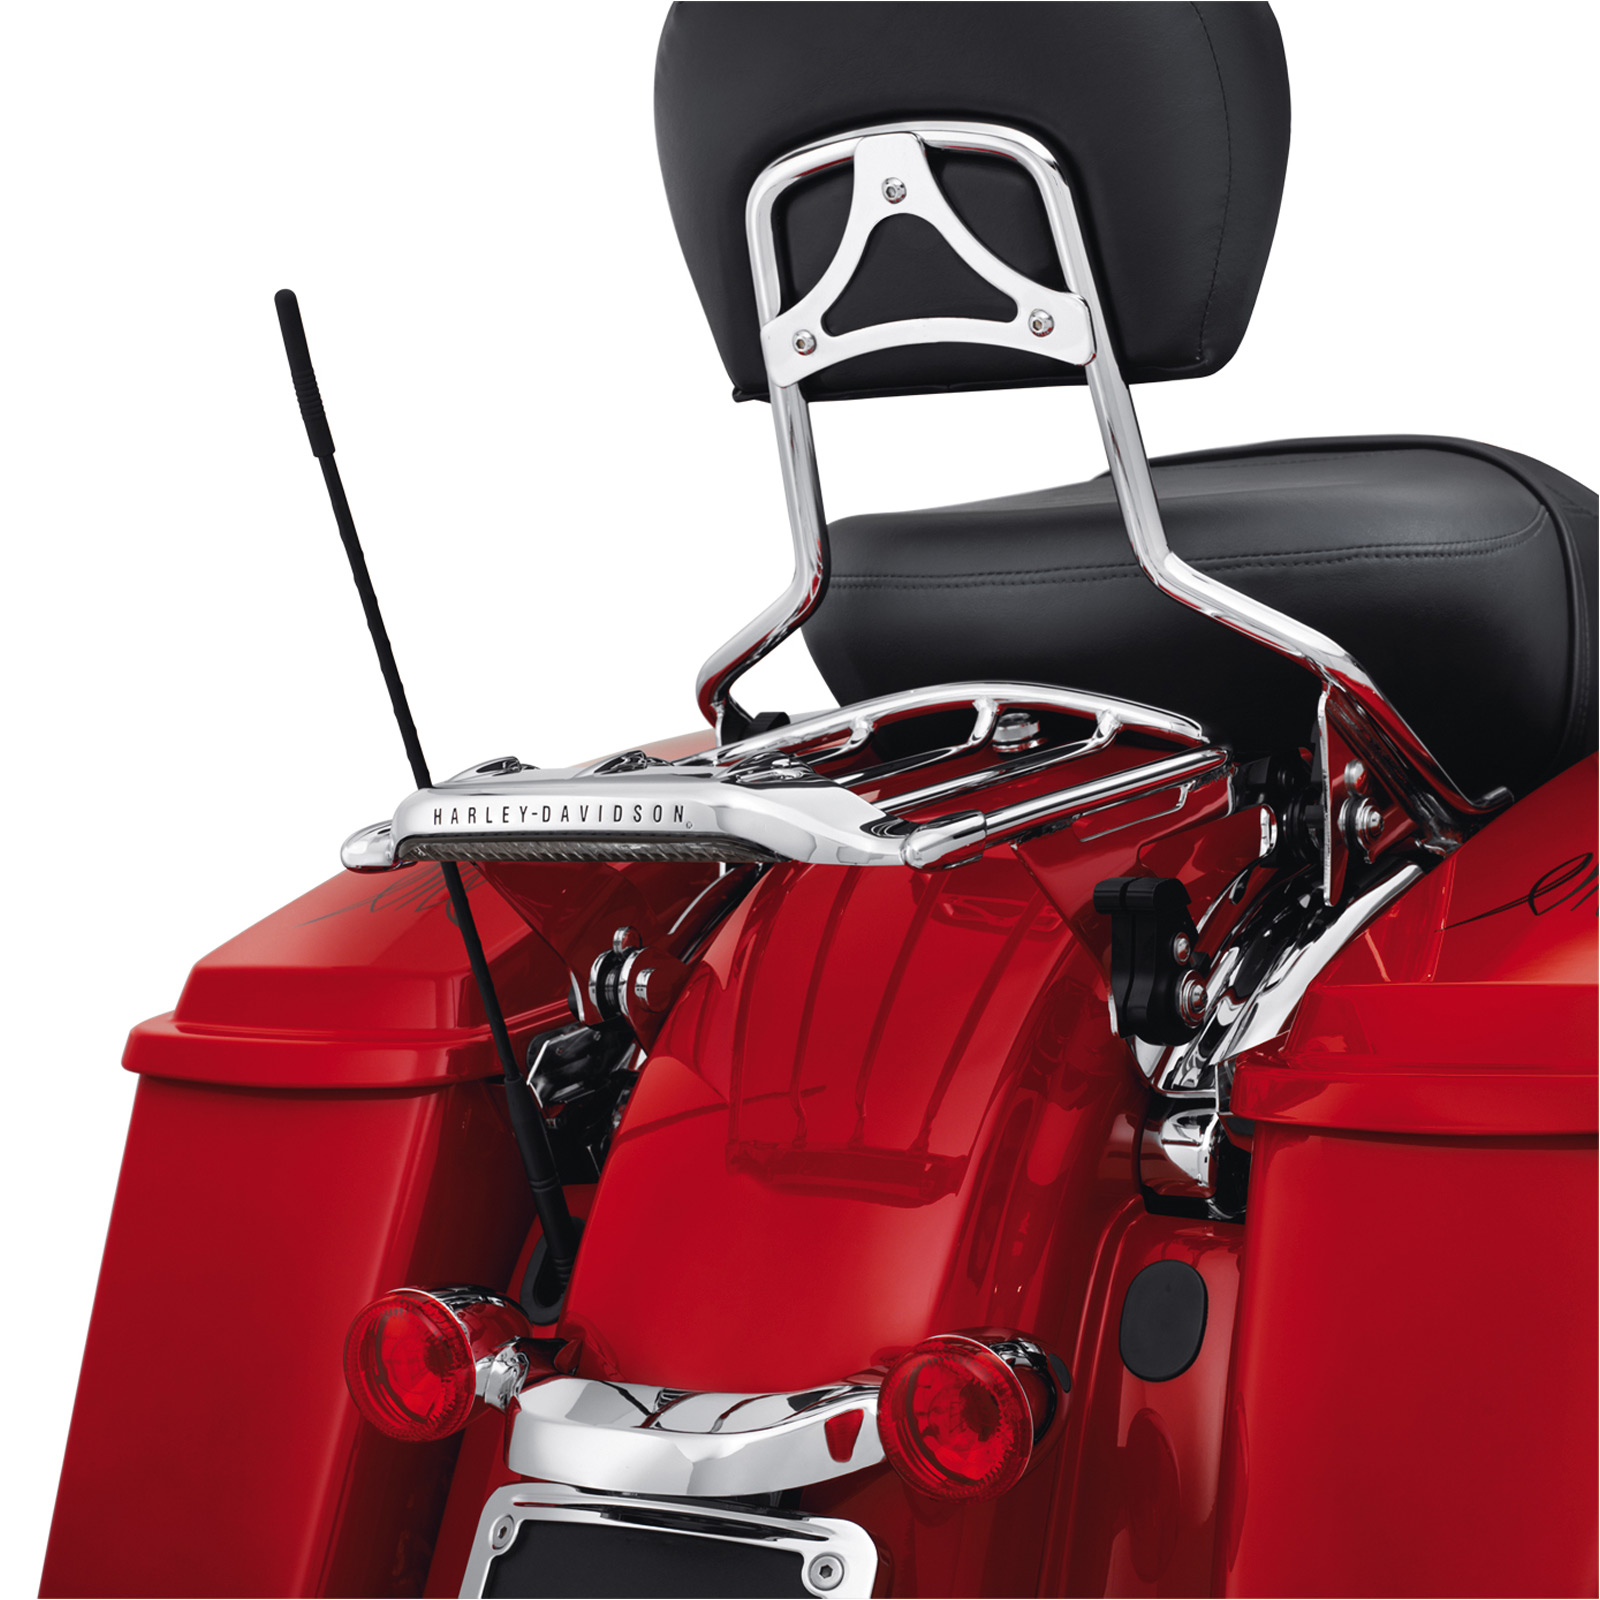 Harley davidson led bag lights : Harley davidson smoked led tail light fits air wing